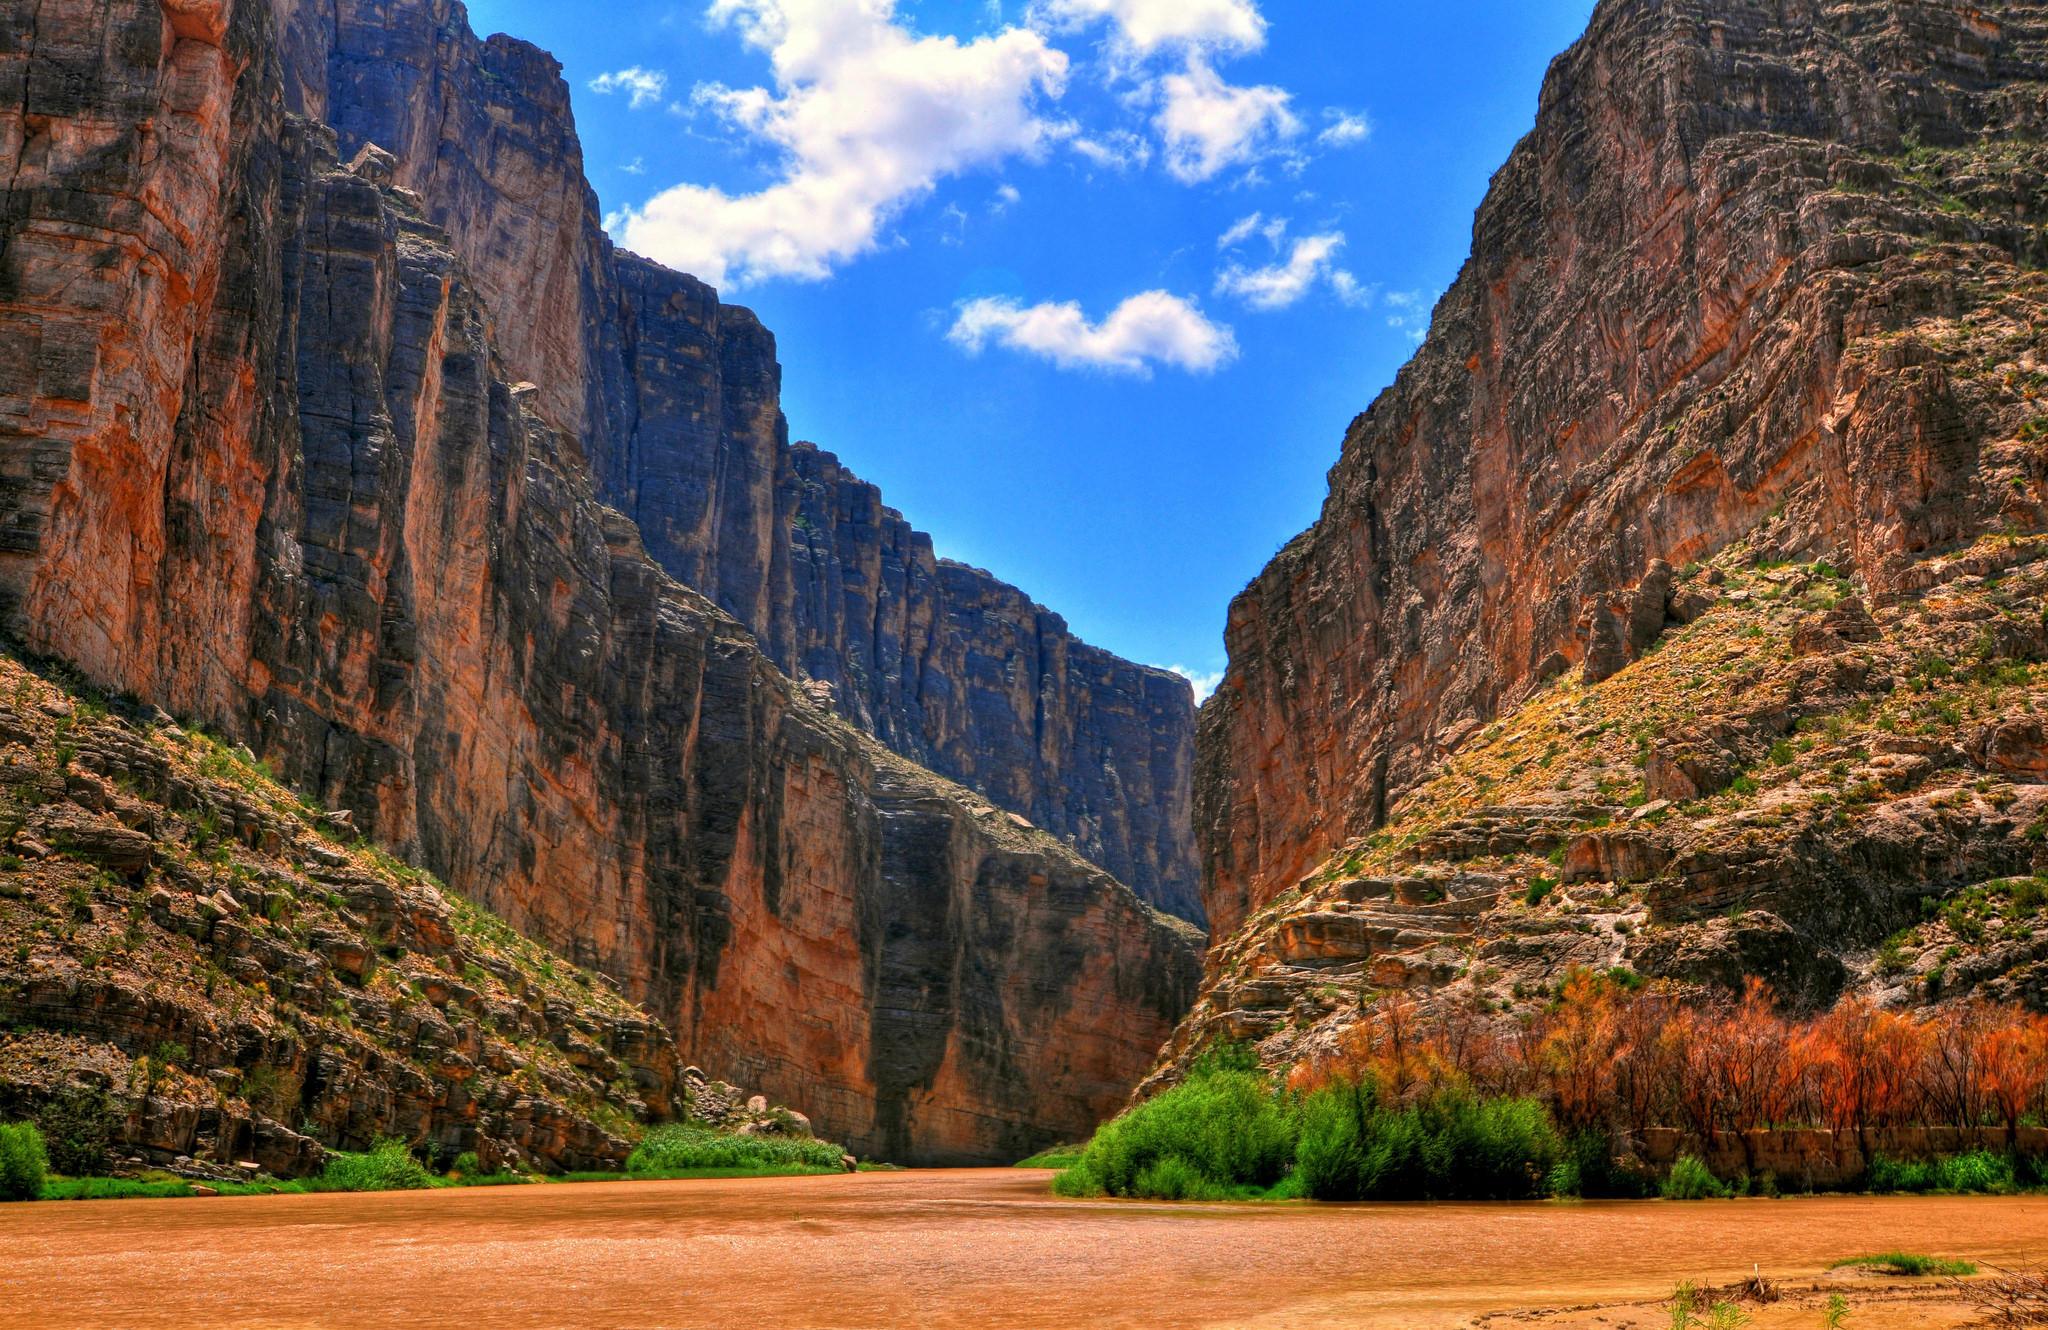 Big Bend National Park wallpaper 2048x1330